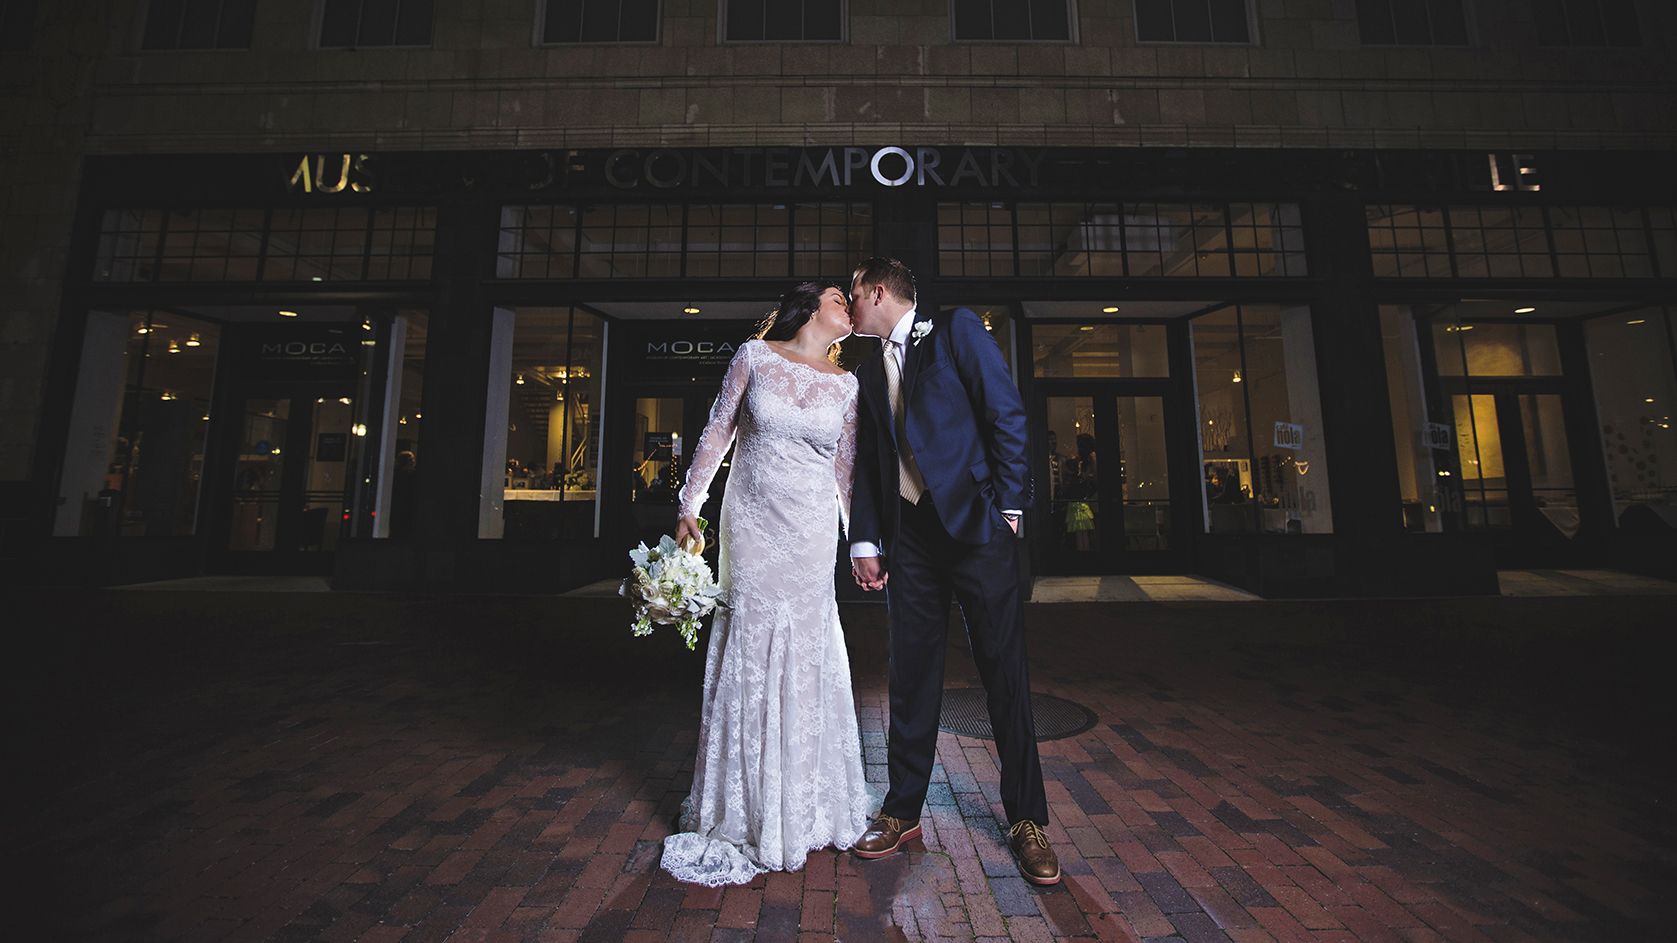 adam-szarmack-wedding-photographer-awesome-4.jpg